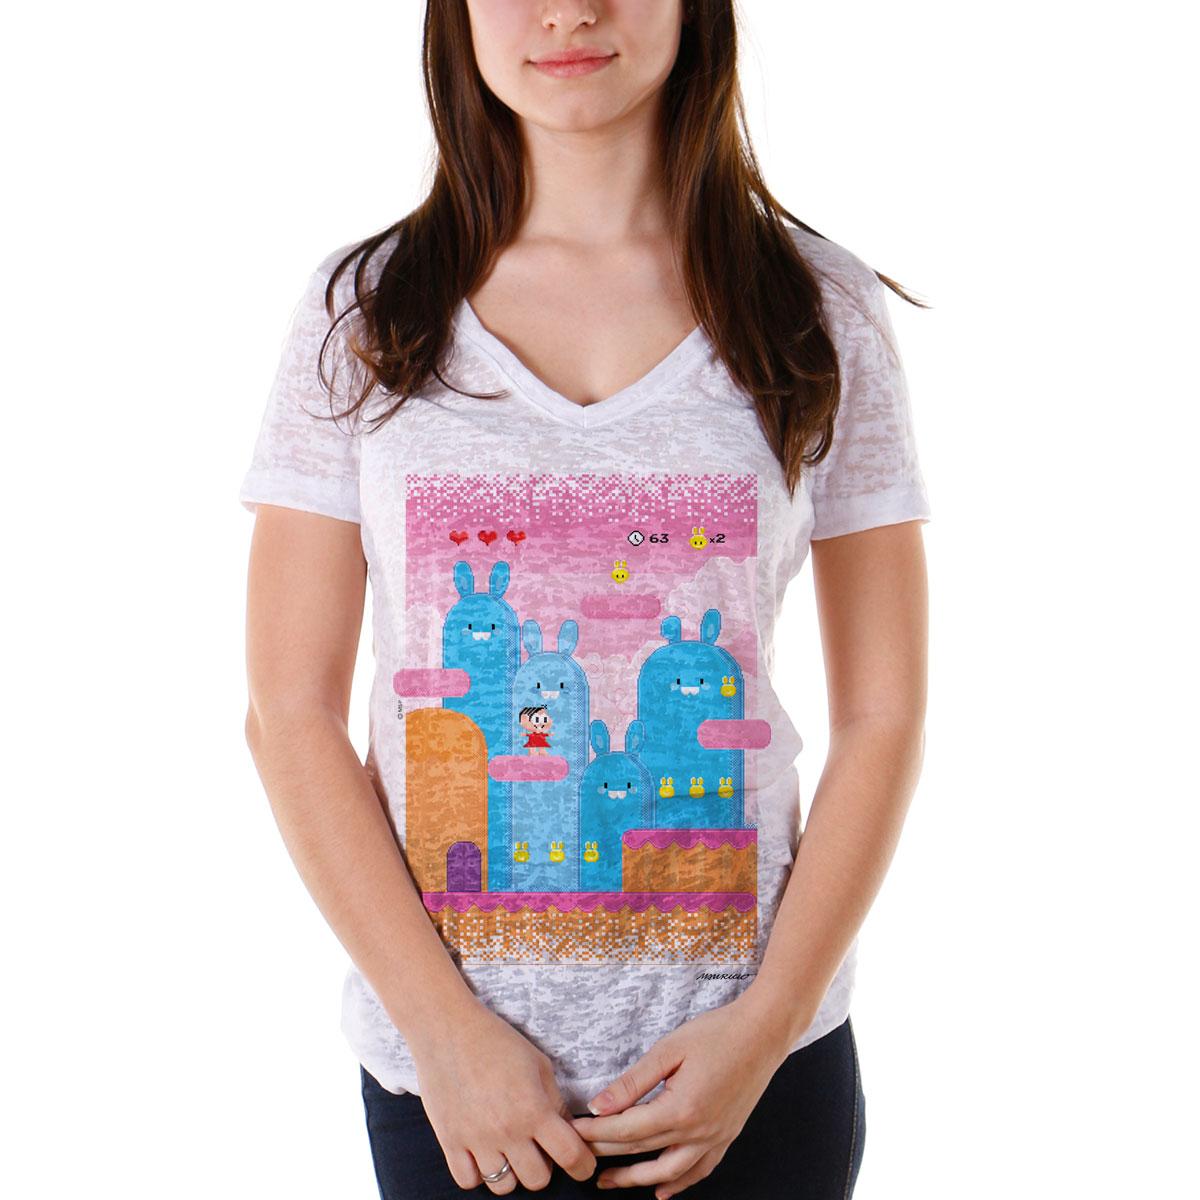 Camiseta Devorê Feminina Turma da Mônica Game